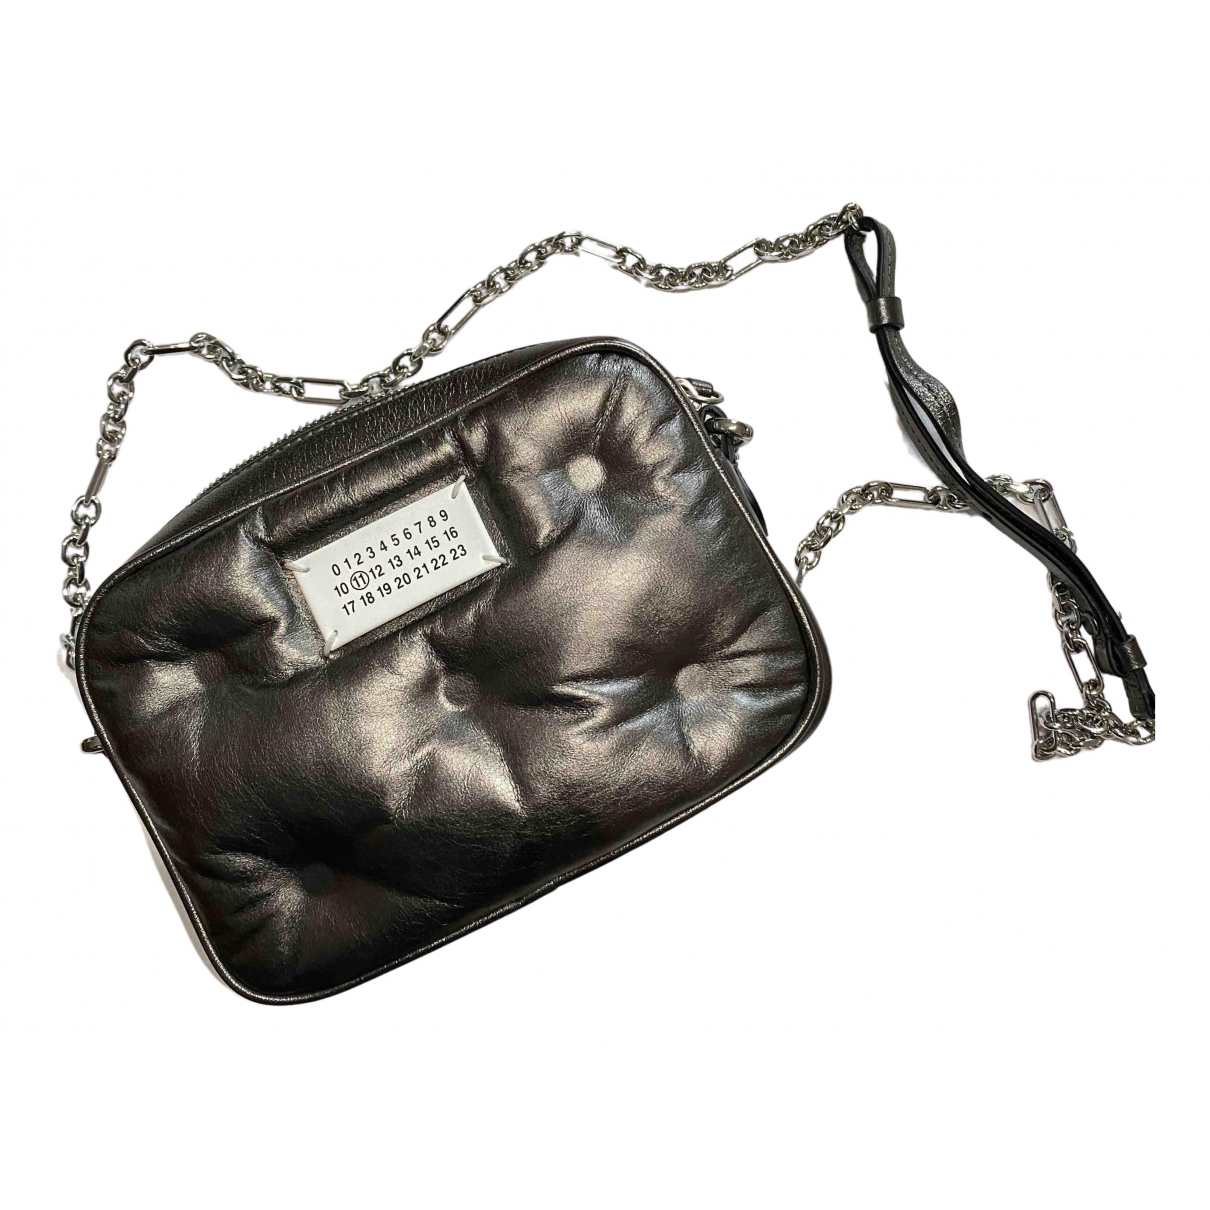 Maison Martin Margiela N Silver Leather handbag for Women N